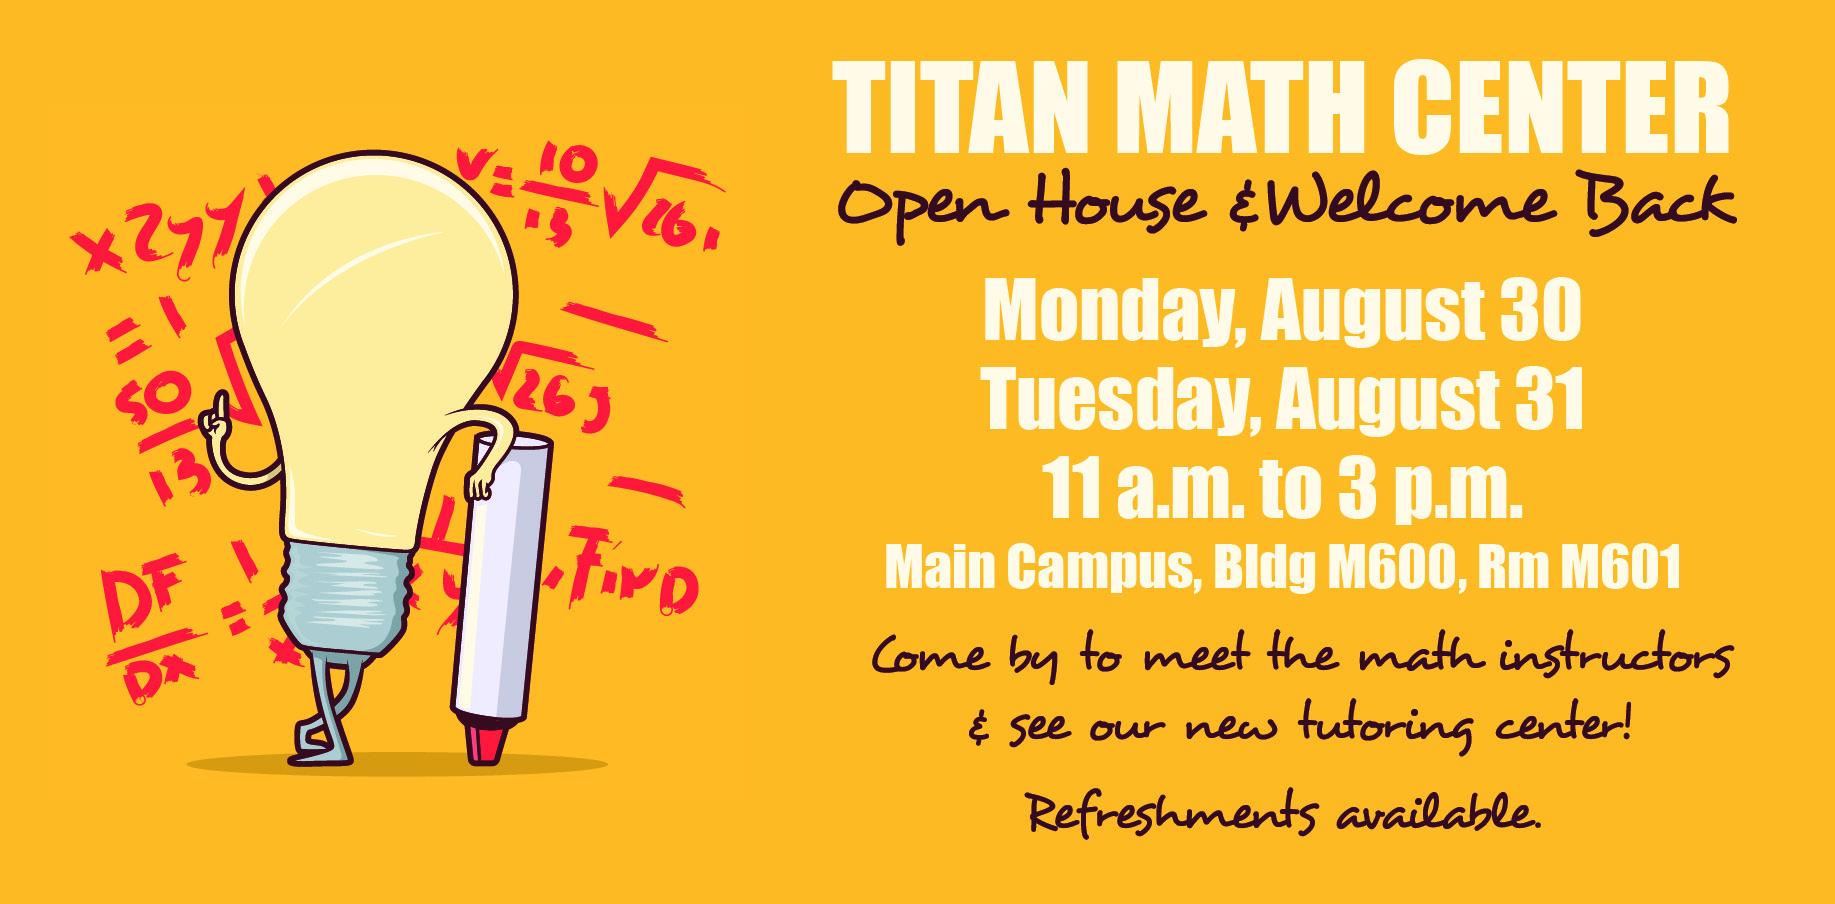 titan math center open house